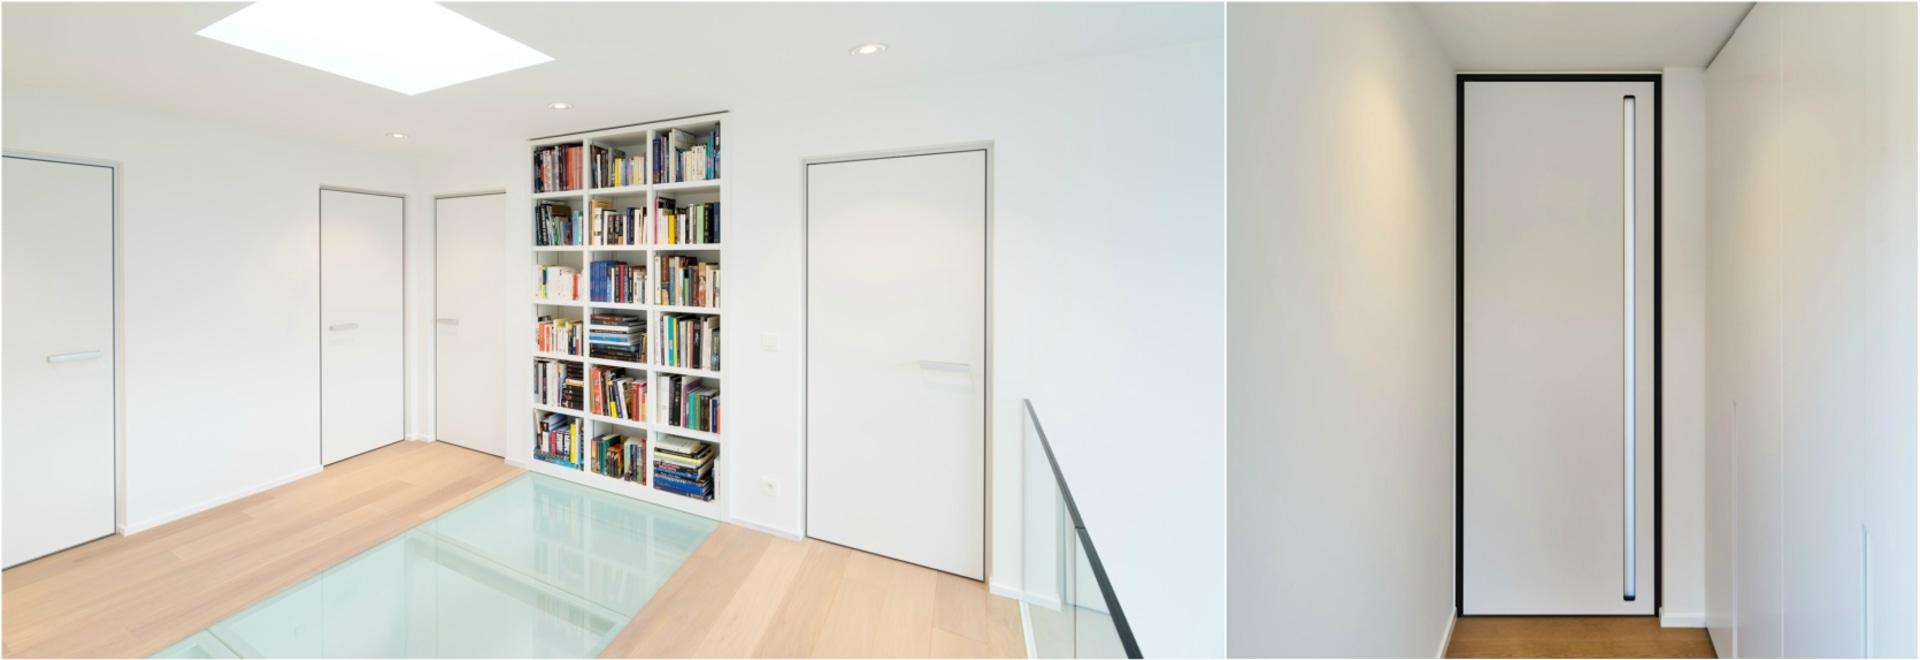 Moderne innentüren  Neu: Zweiwegtür durch IRGENDWIE TÜREN - Nijverheidsweg 32, 2240 ...